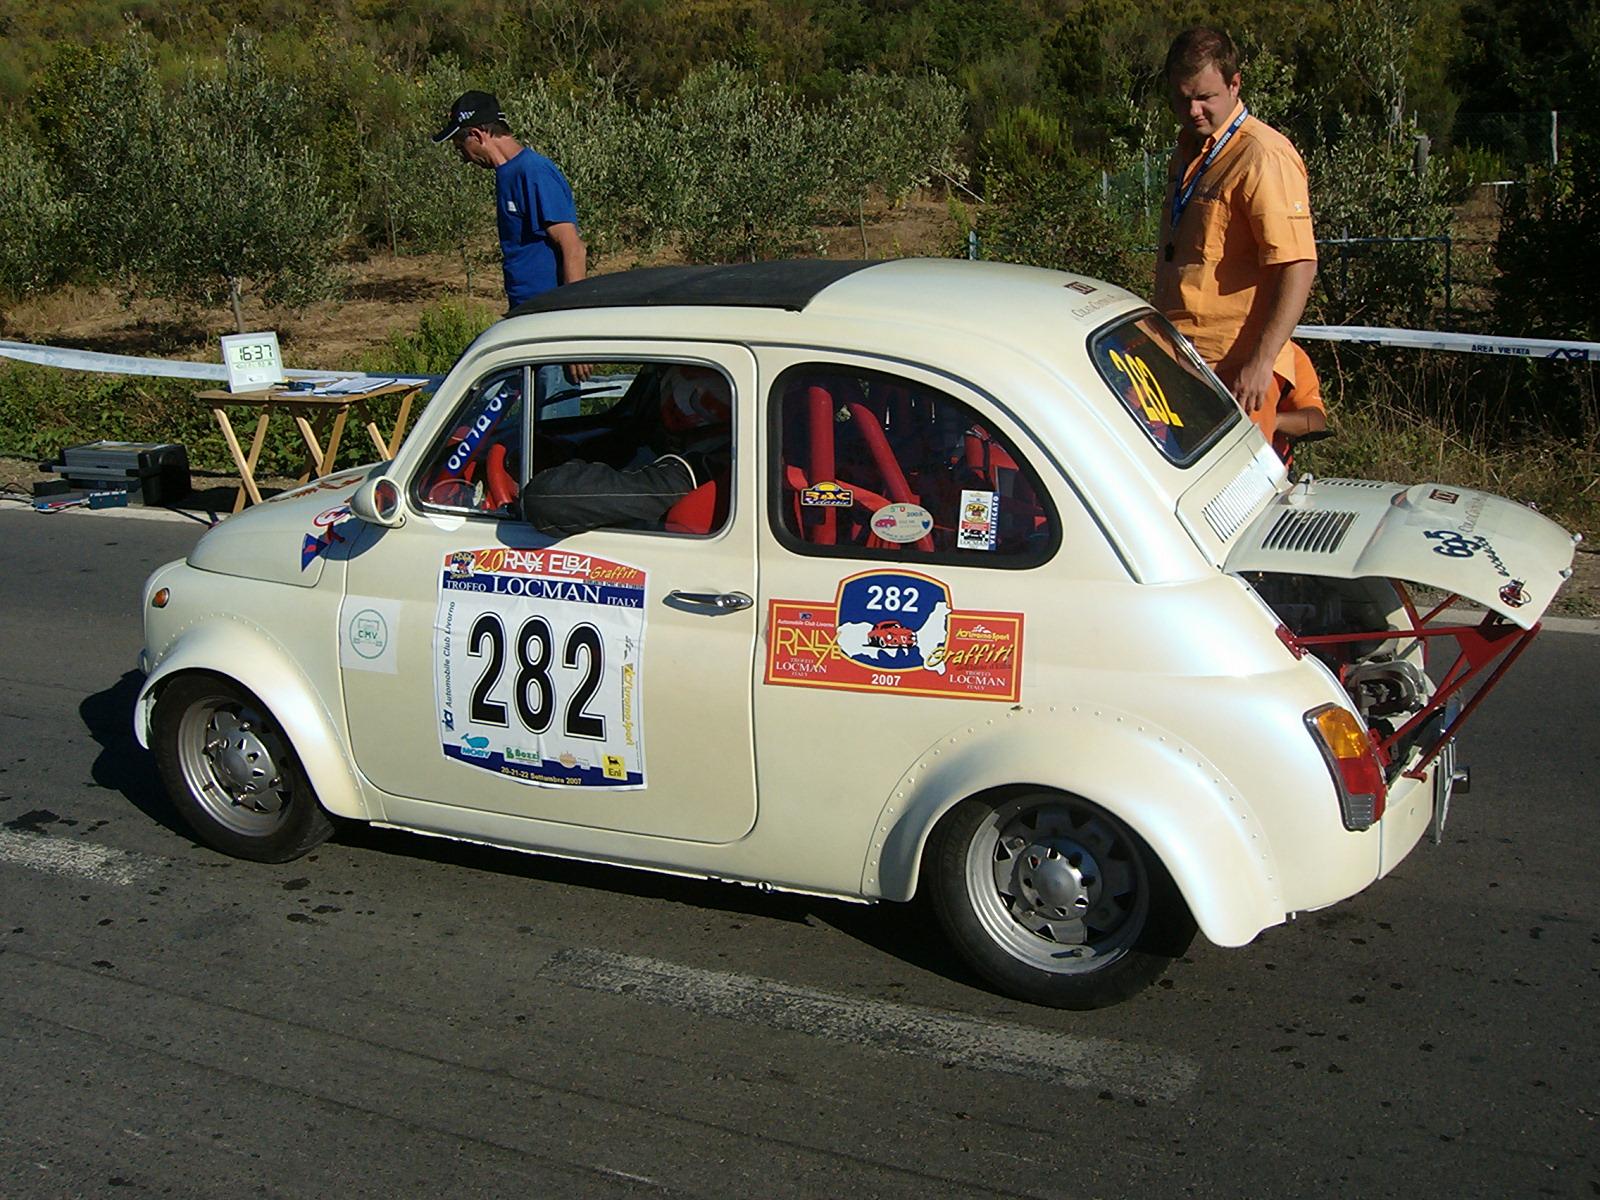 Storico 2007 - Fiat 500 L